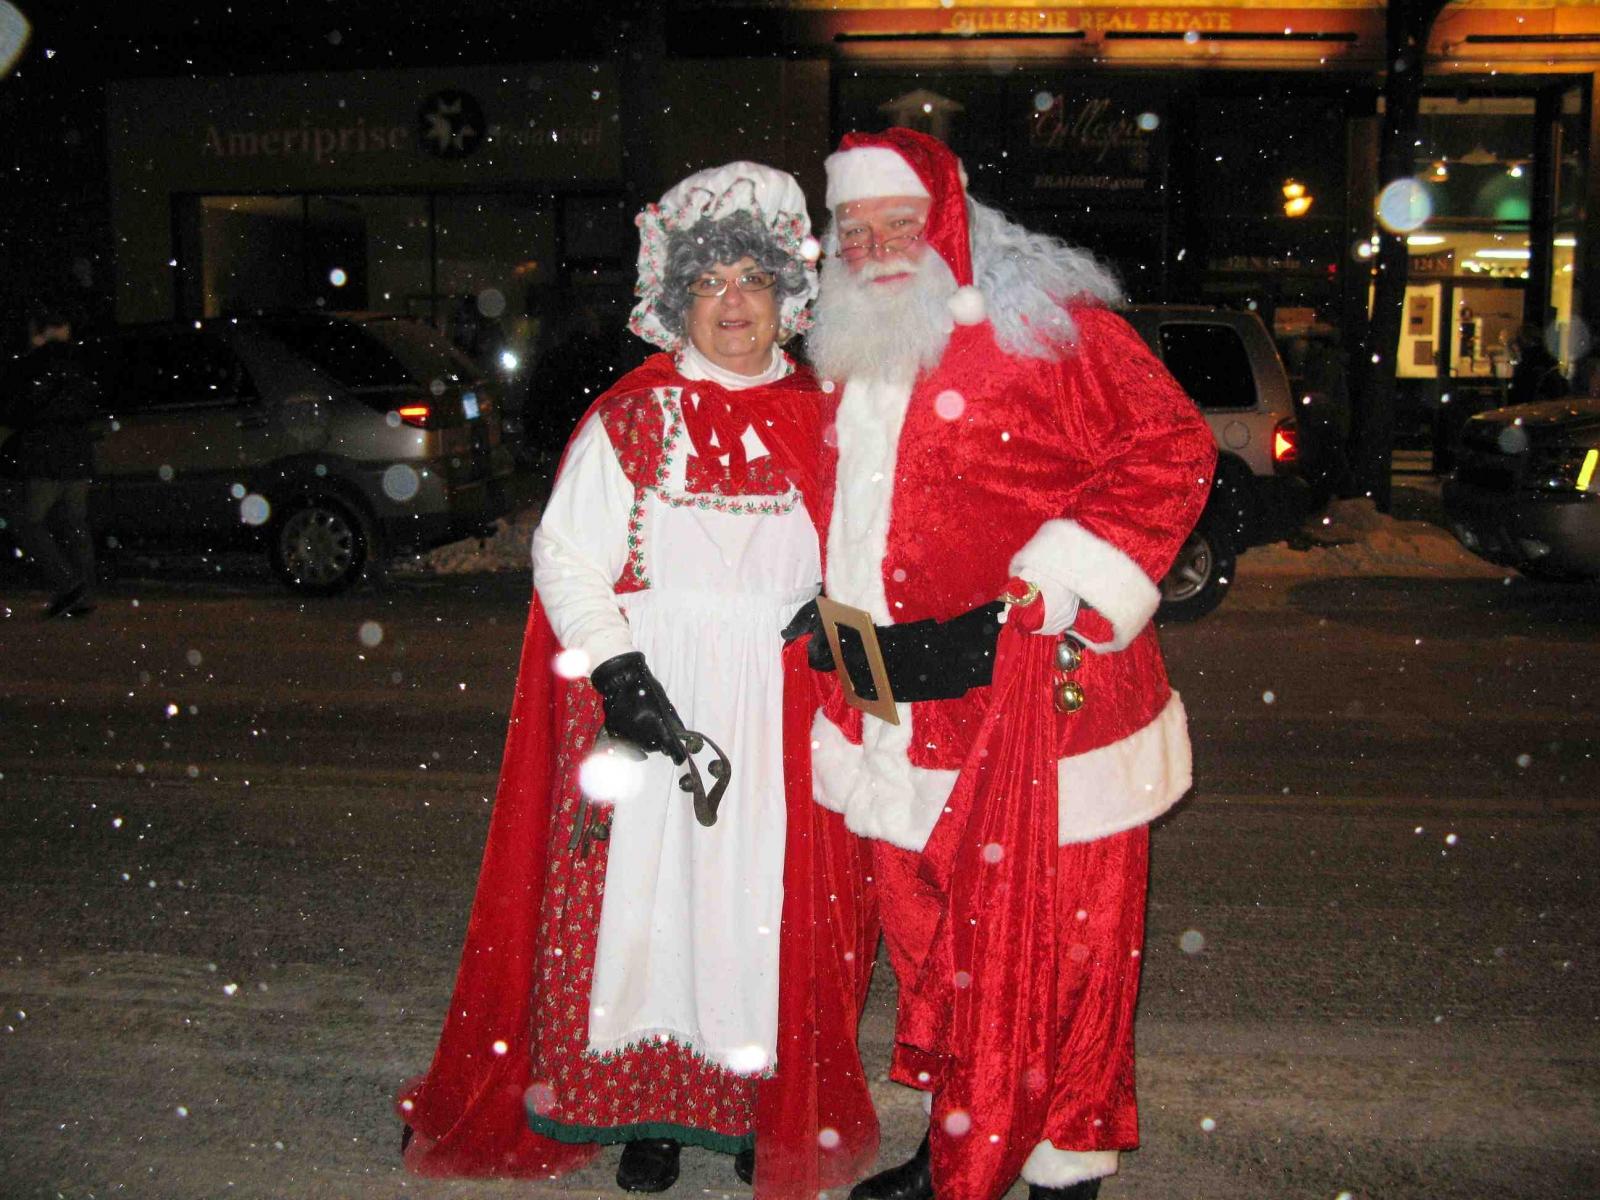 Owatonna Holidays with Santa